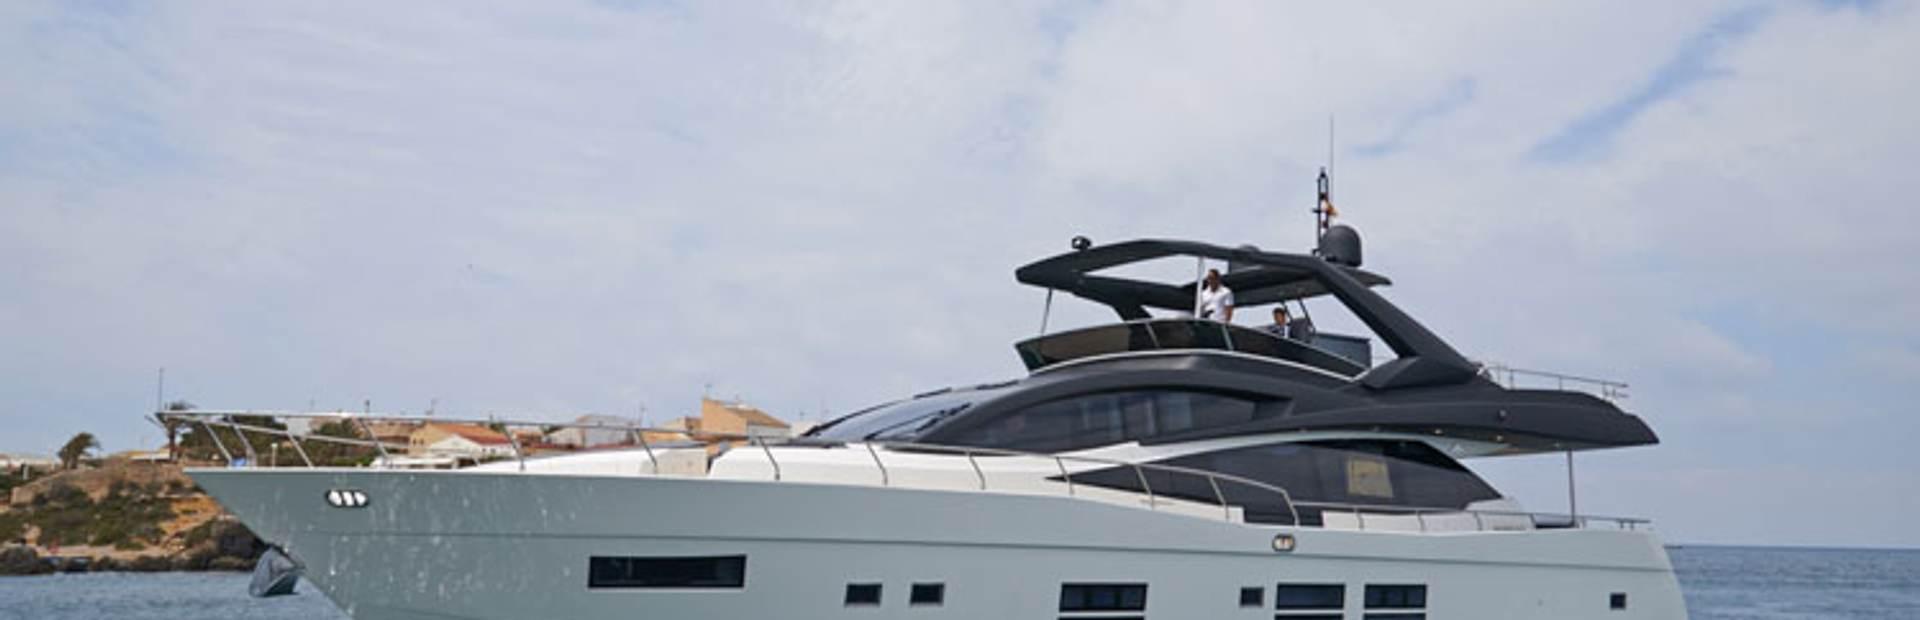 80 GLX Yacht Charter